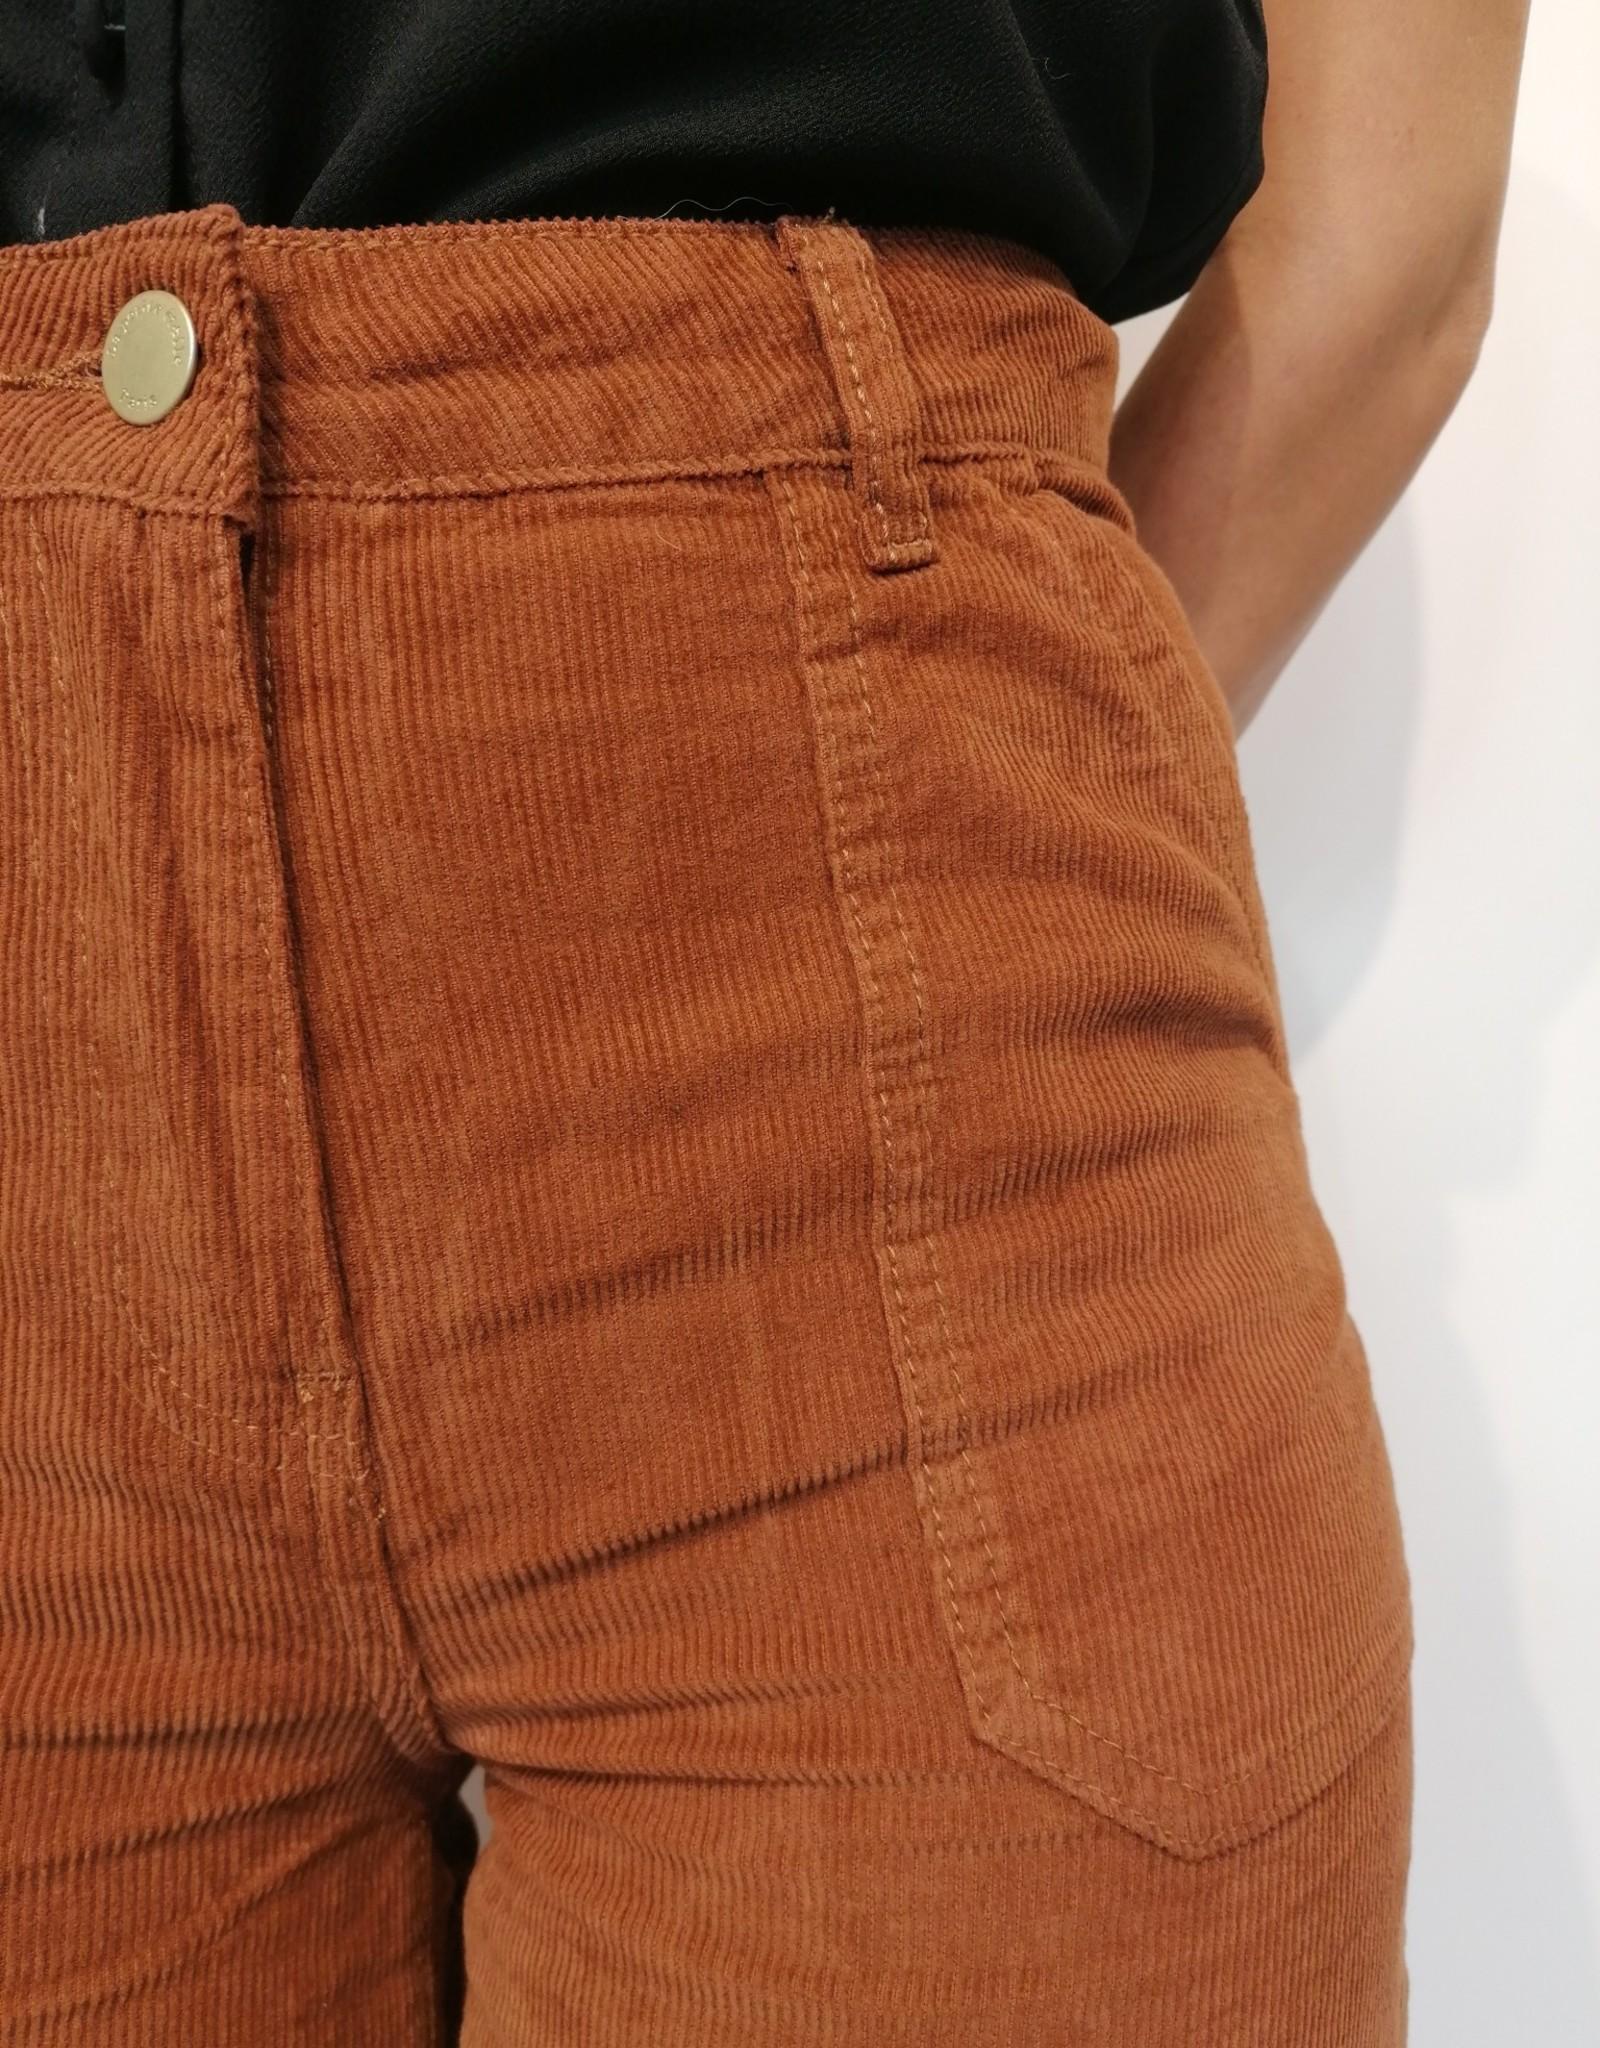 Pantalon Mali - Camel